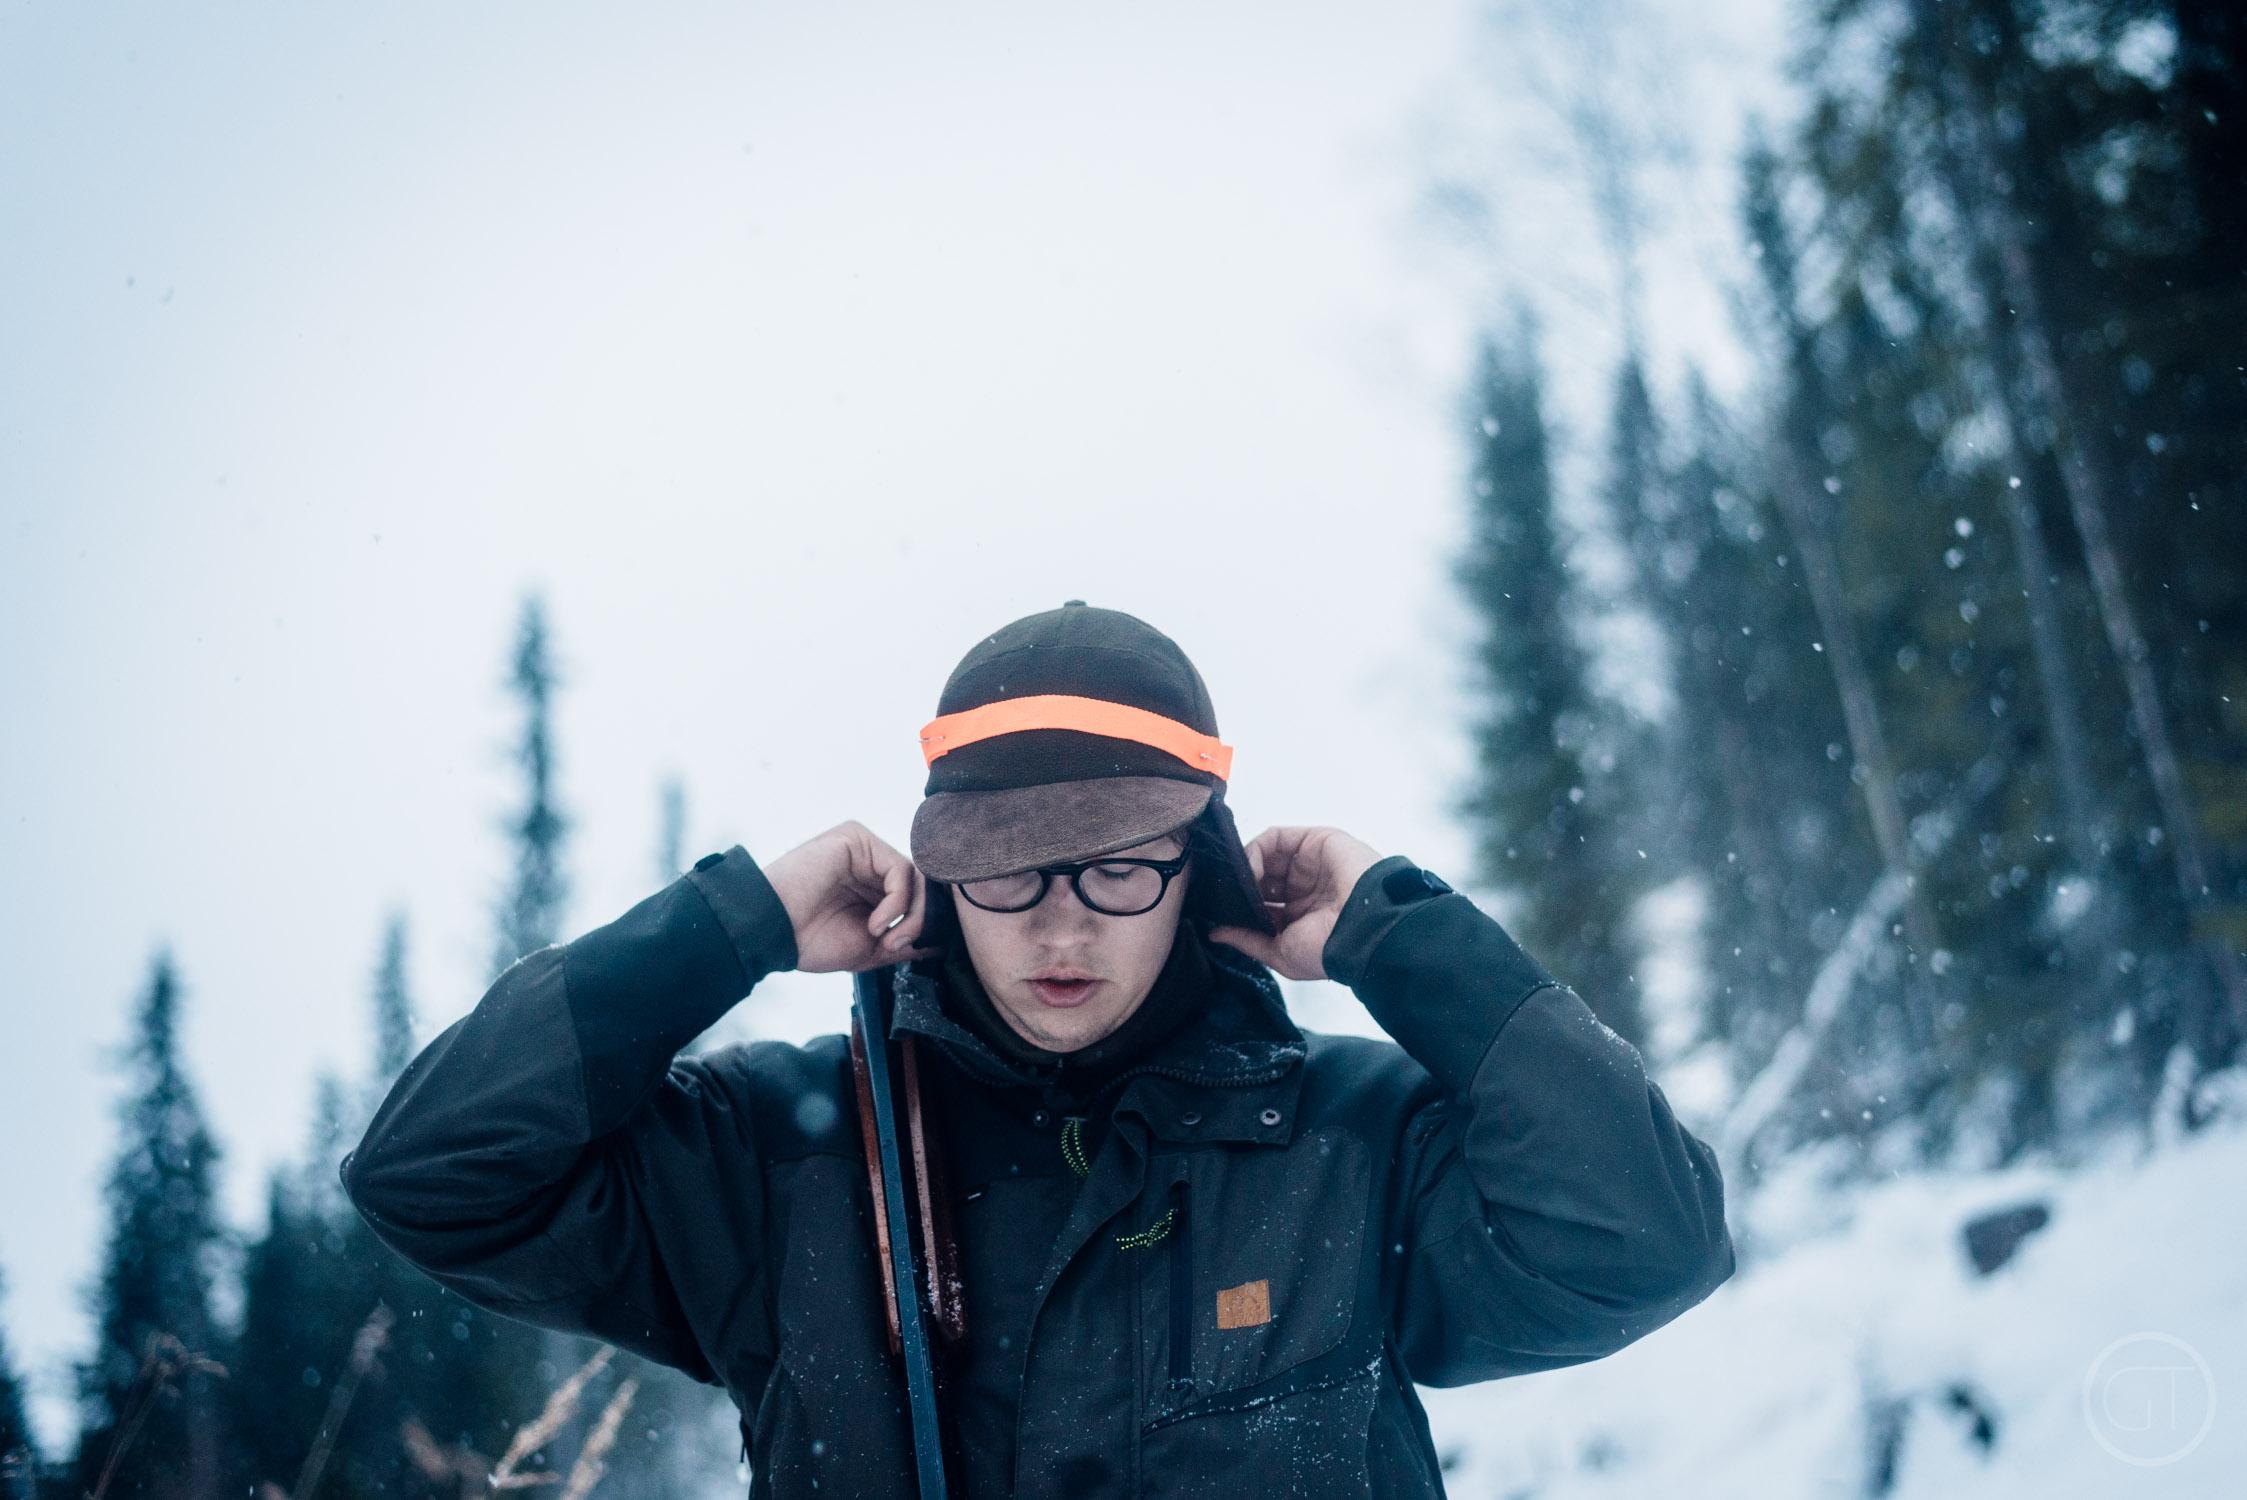 GUSTAV_THUESEN_HUNTING_NORWAY_OUTDOOR_LIFESTYLE_PHOTOGRAPHER_PROFESSIONAL-33.jpg